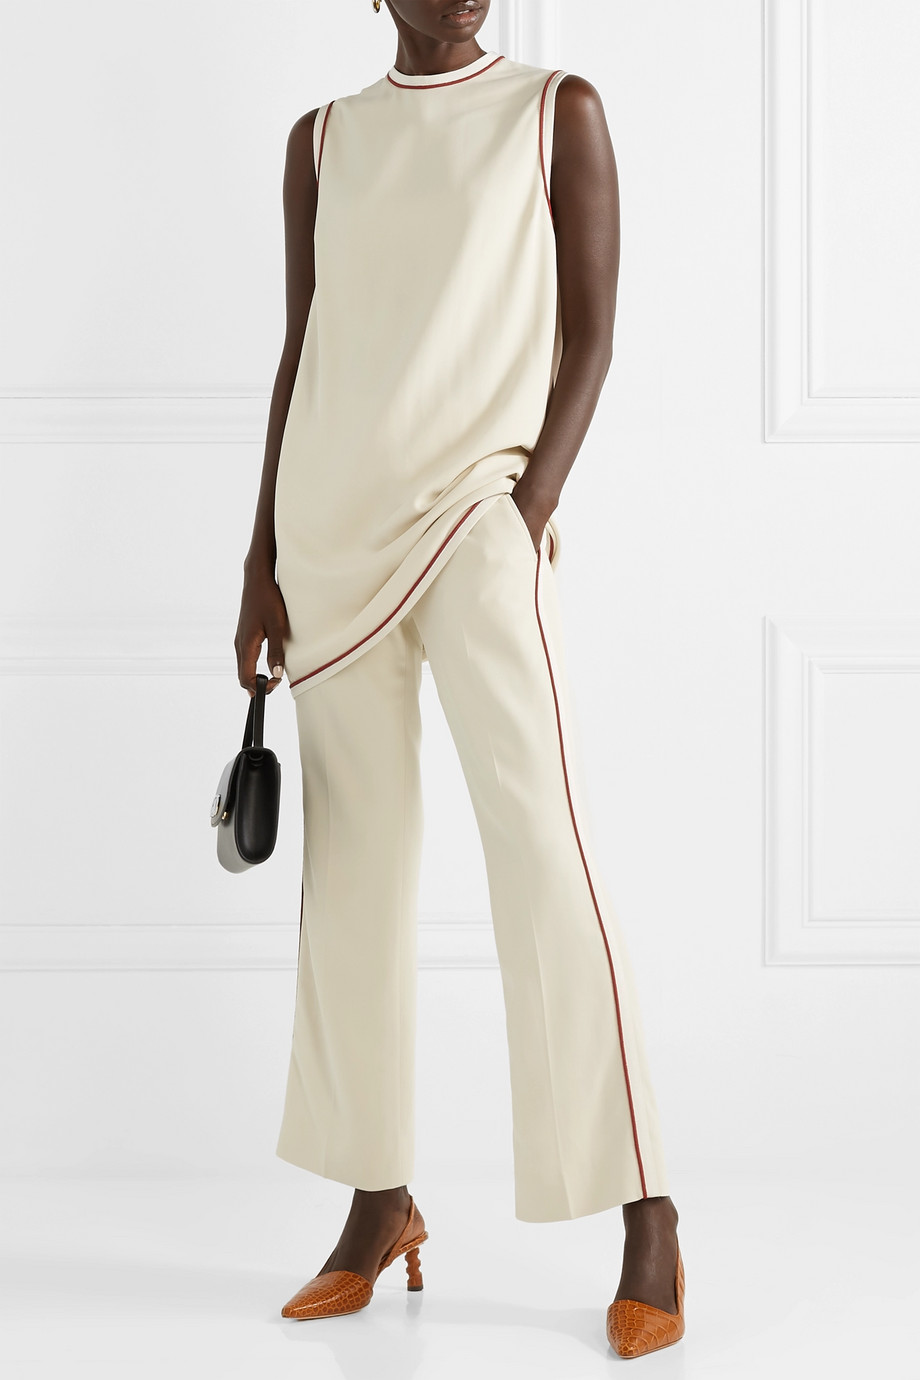 Gucci Grosgrain-trimmed cady bootcut pants